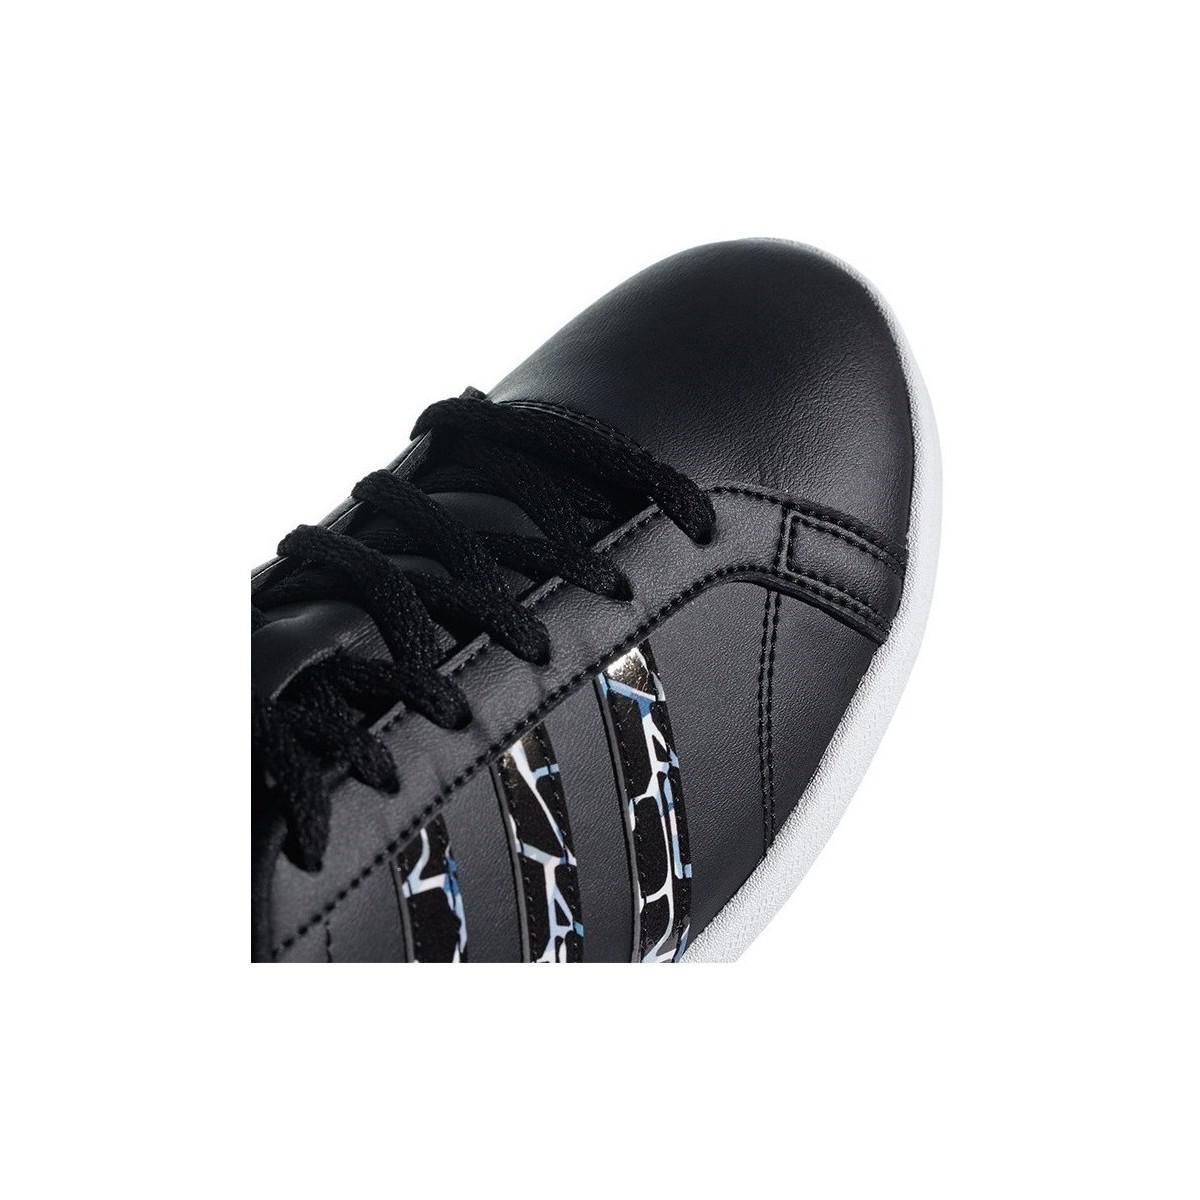 Adidas Sneaker low VS Coneo QT W für Damen in schwarz im